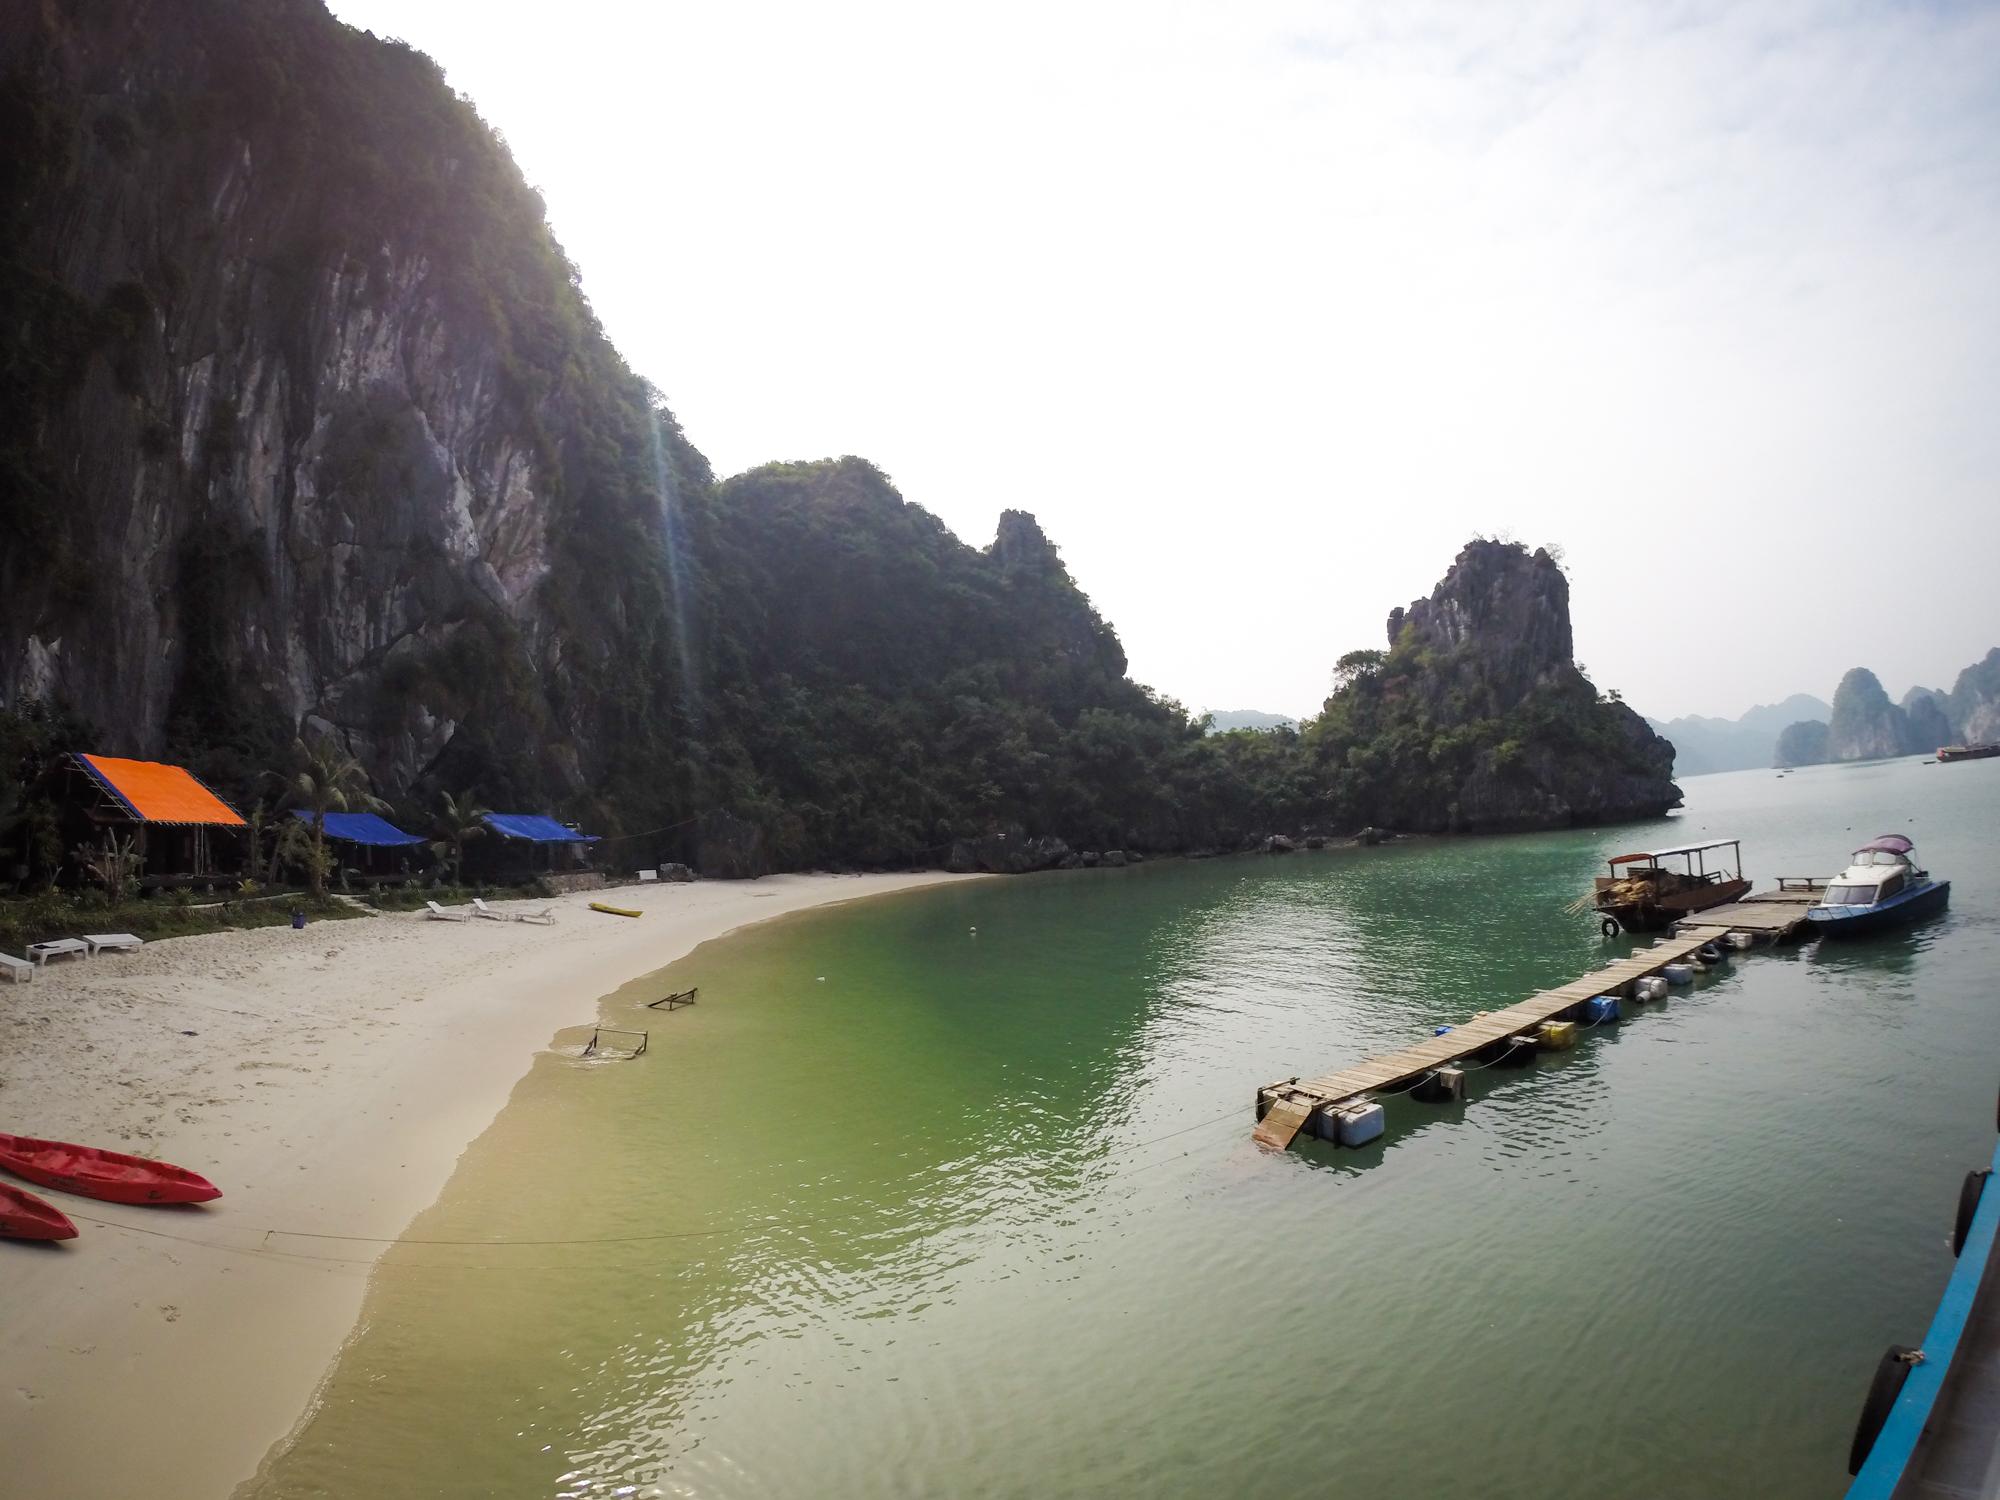 Elaine Villatoro - Live More, Travel More - Vietnam - Vietnã - Halong Bay - Castaway Islands - Vietnam Backpackers - Hanoi Backpackers - Beach - Praia